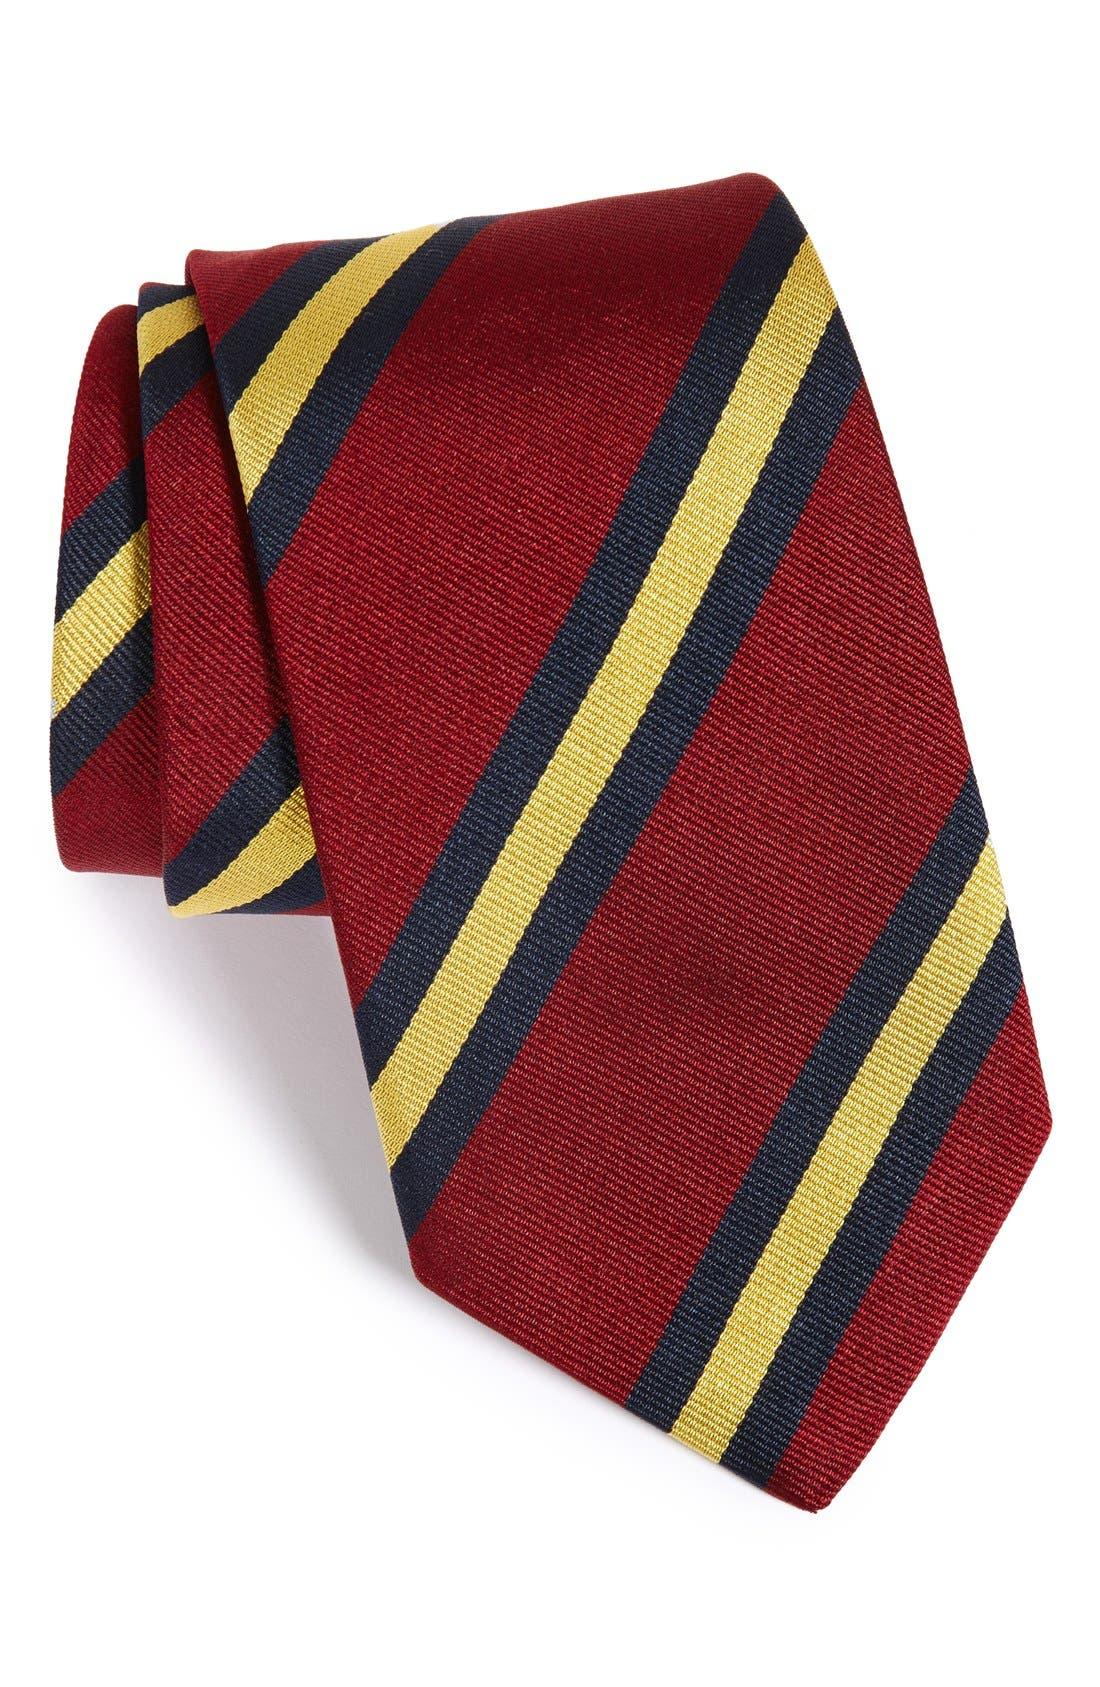 StripeSilk Tie,                         Main,                         color, 930